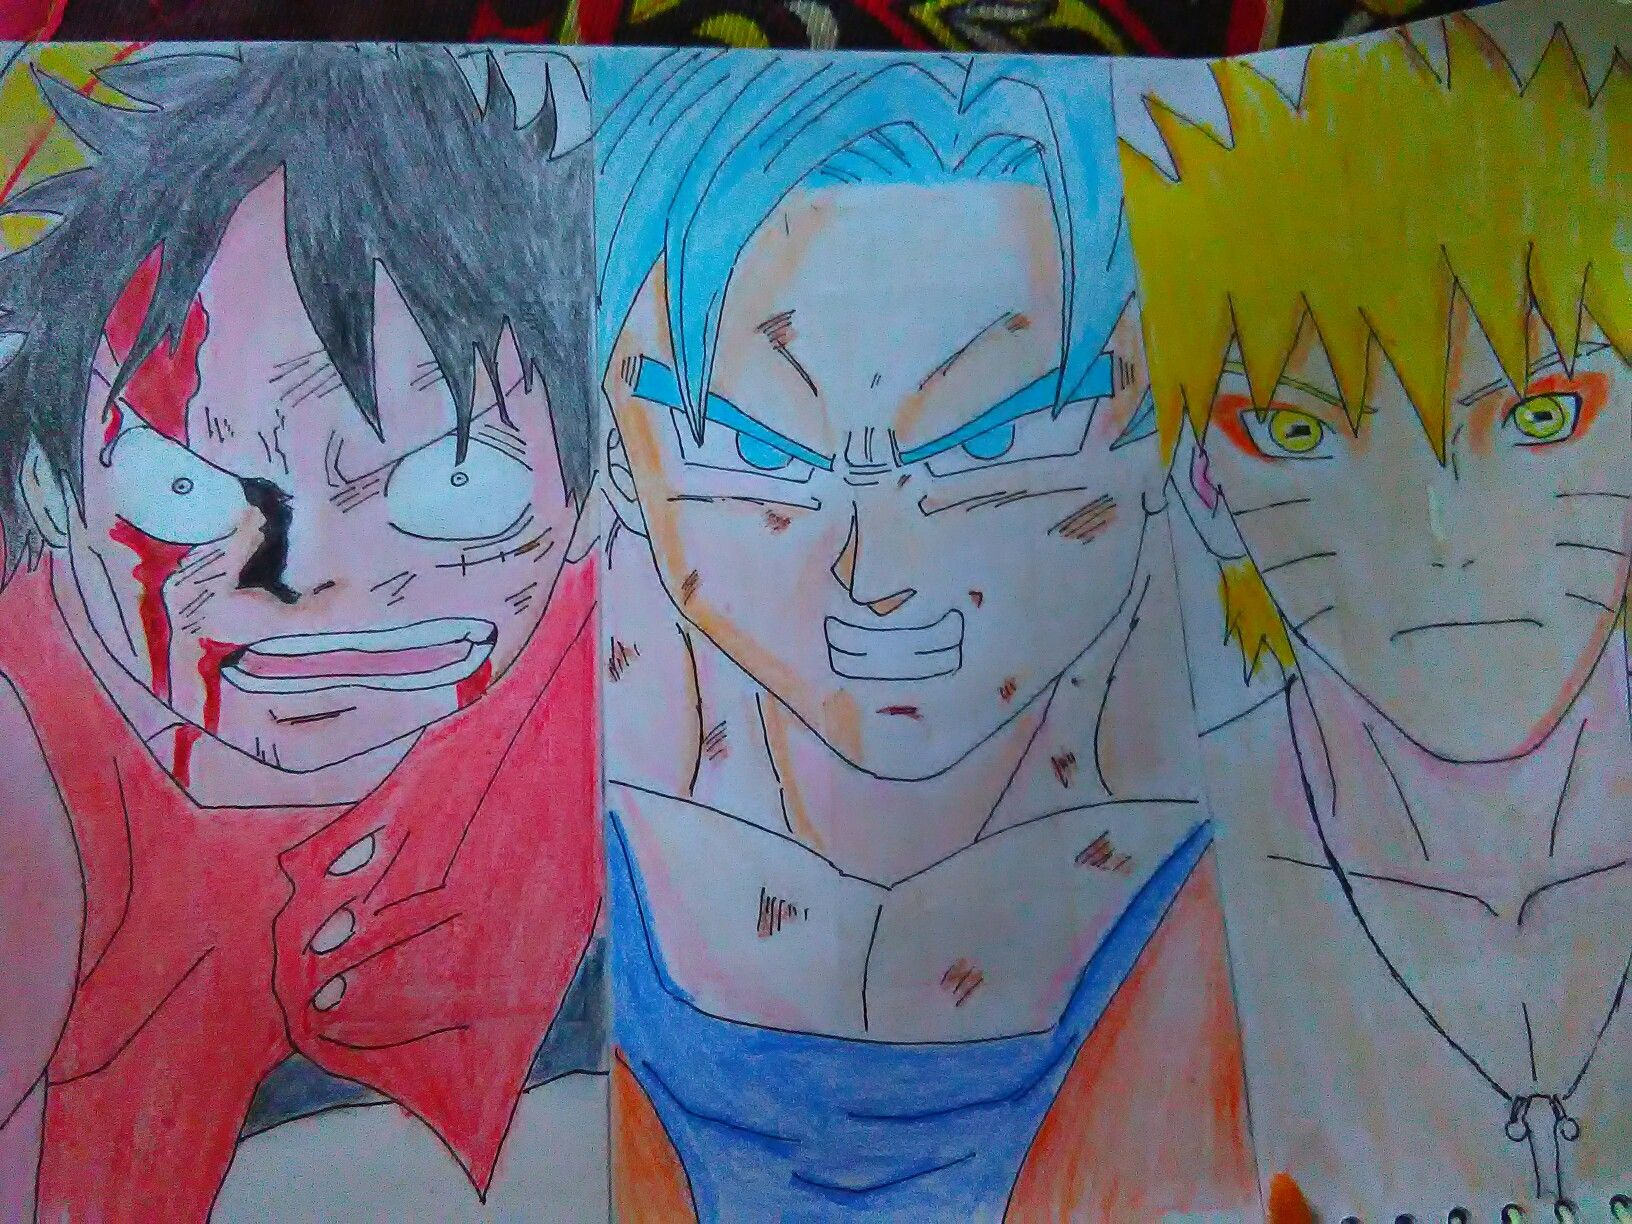 New drawing by me fusion of goku naruto luffy anime art amino Drawing Of Goku Luffy And Naruto Finished Anime Crossover Goku Drawing Anime